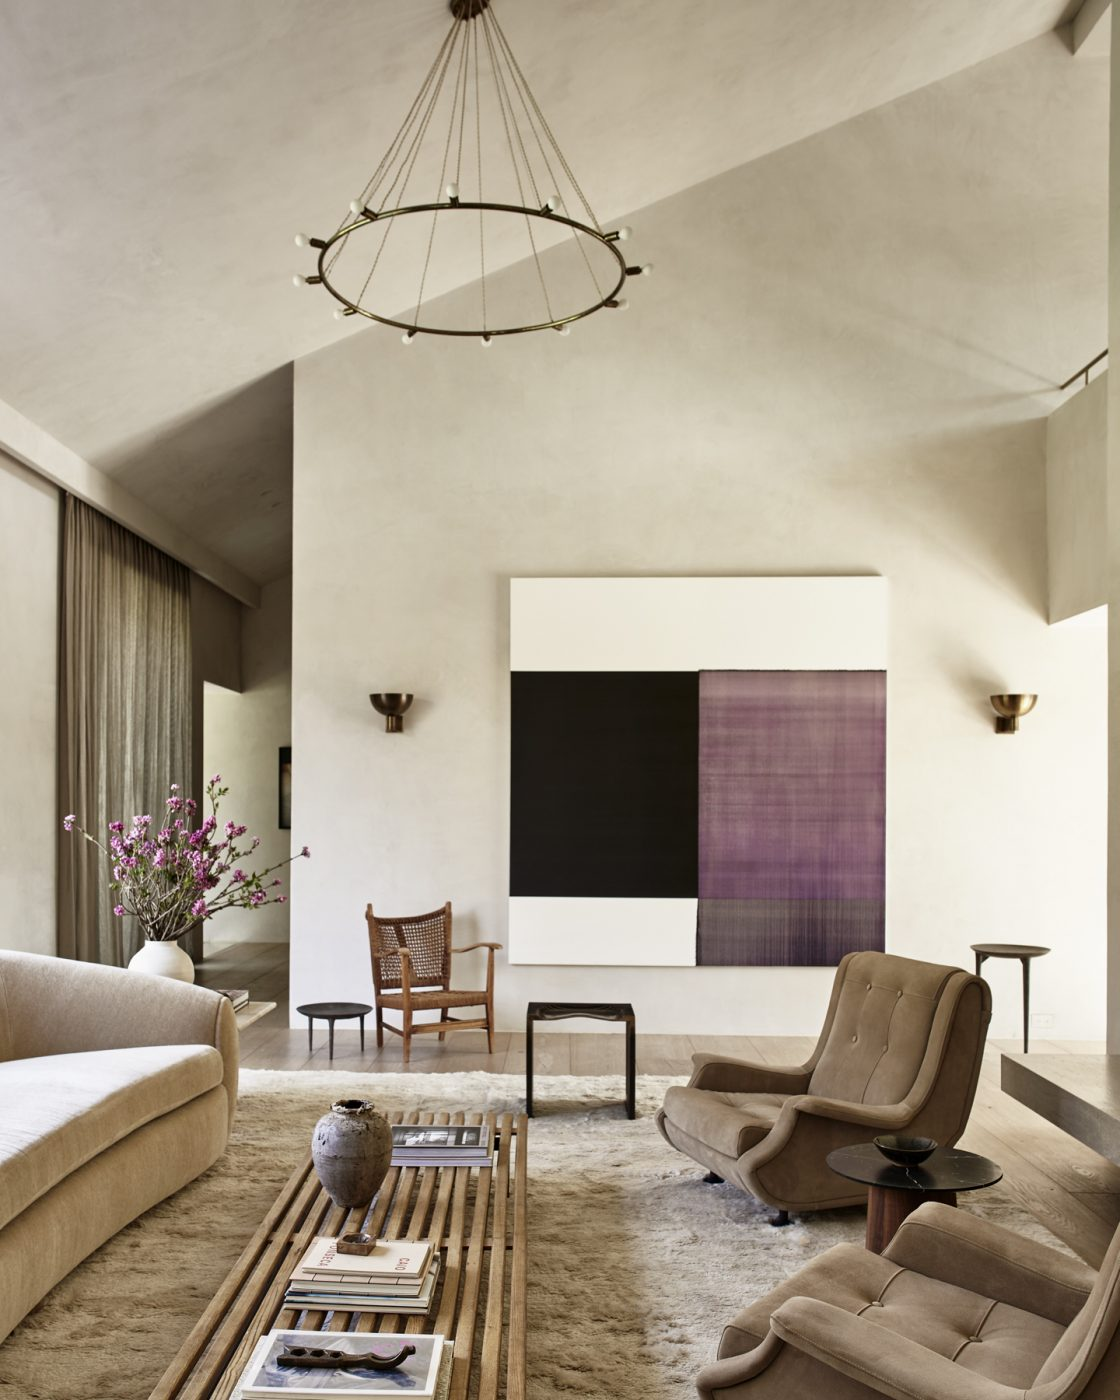 Living room in Malibu designed by Alexander